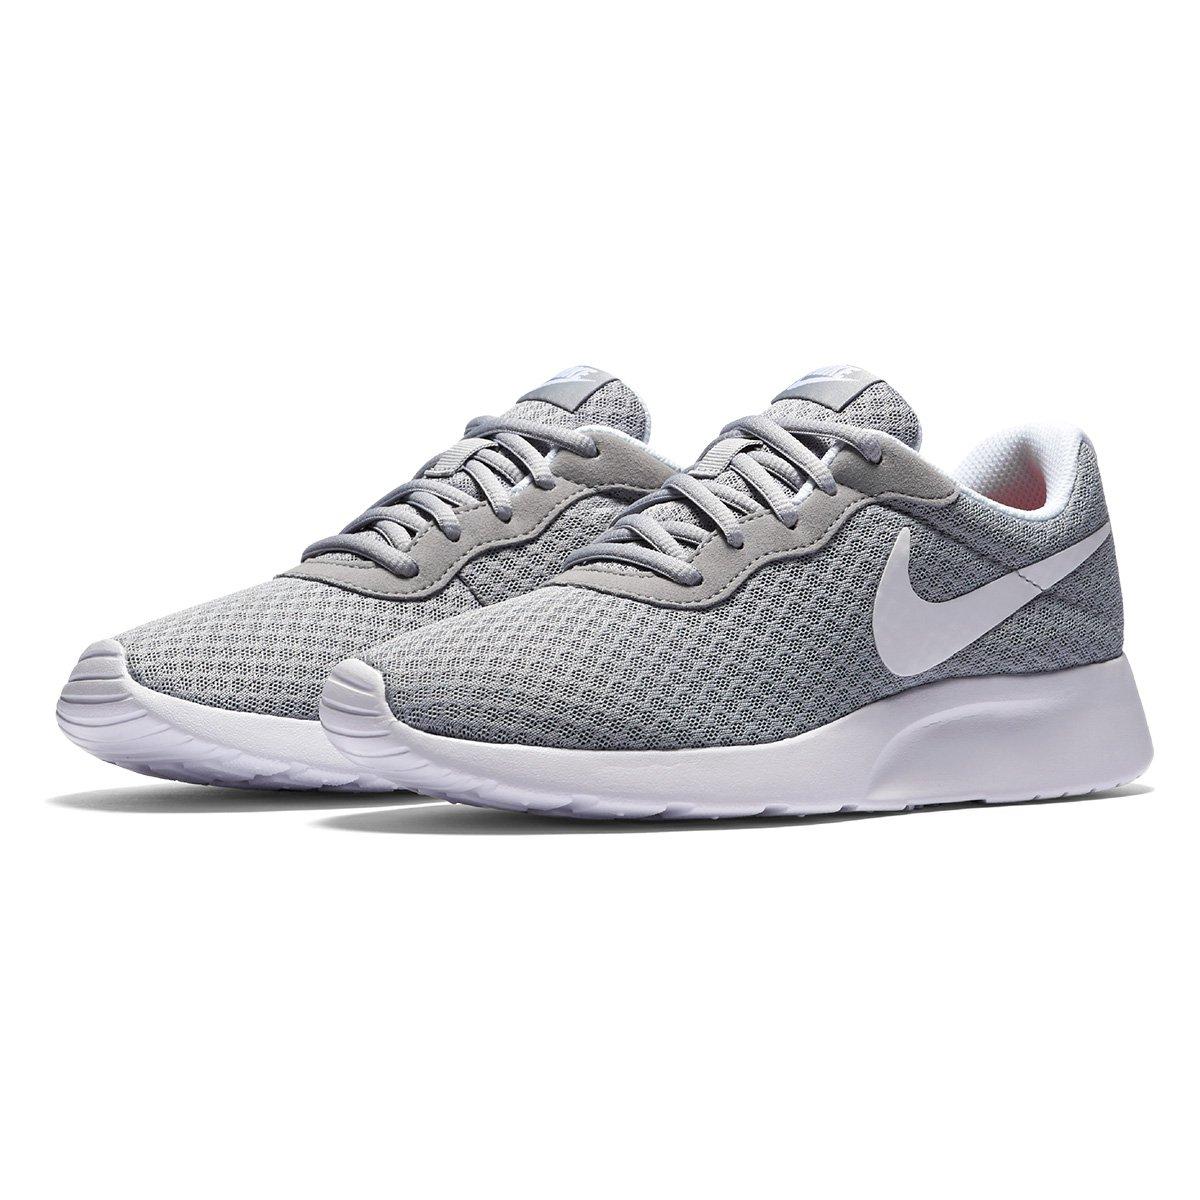 f9930a3e77e Tênis Nike Tanjun Feminino - Cinza e Branco - Compre Agora